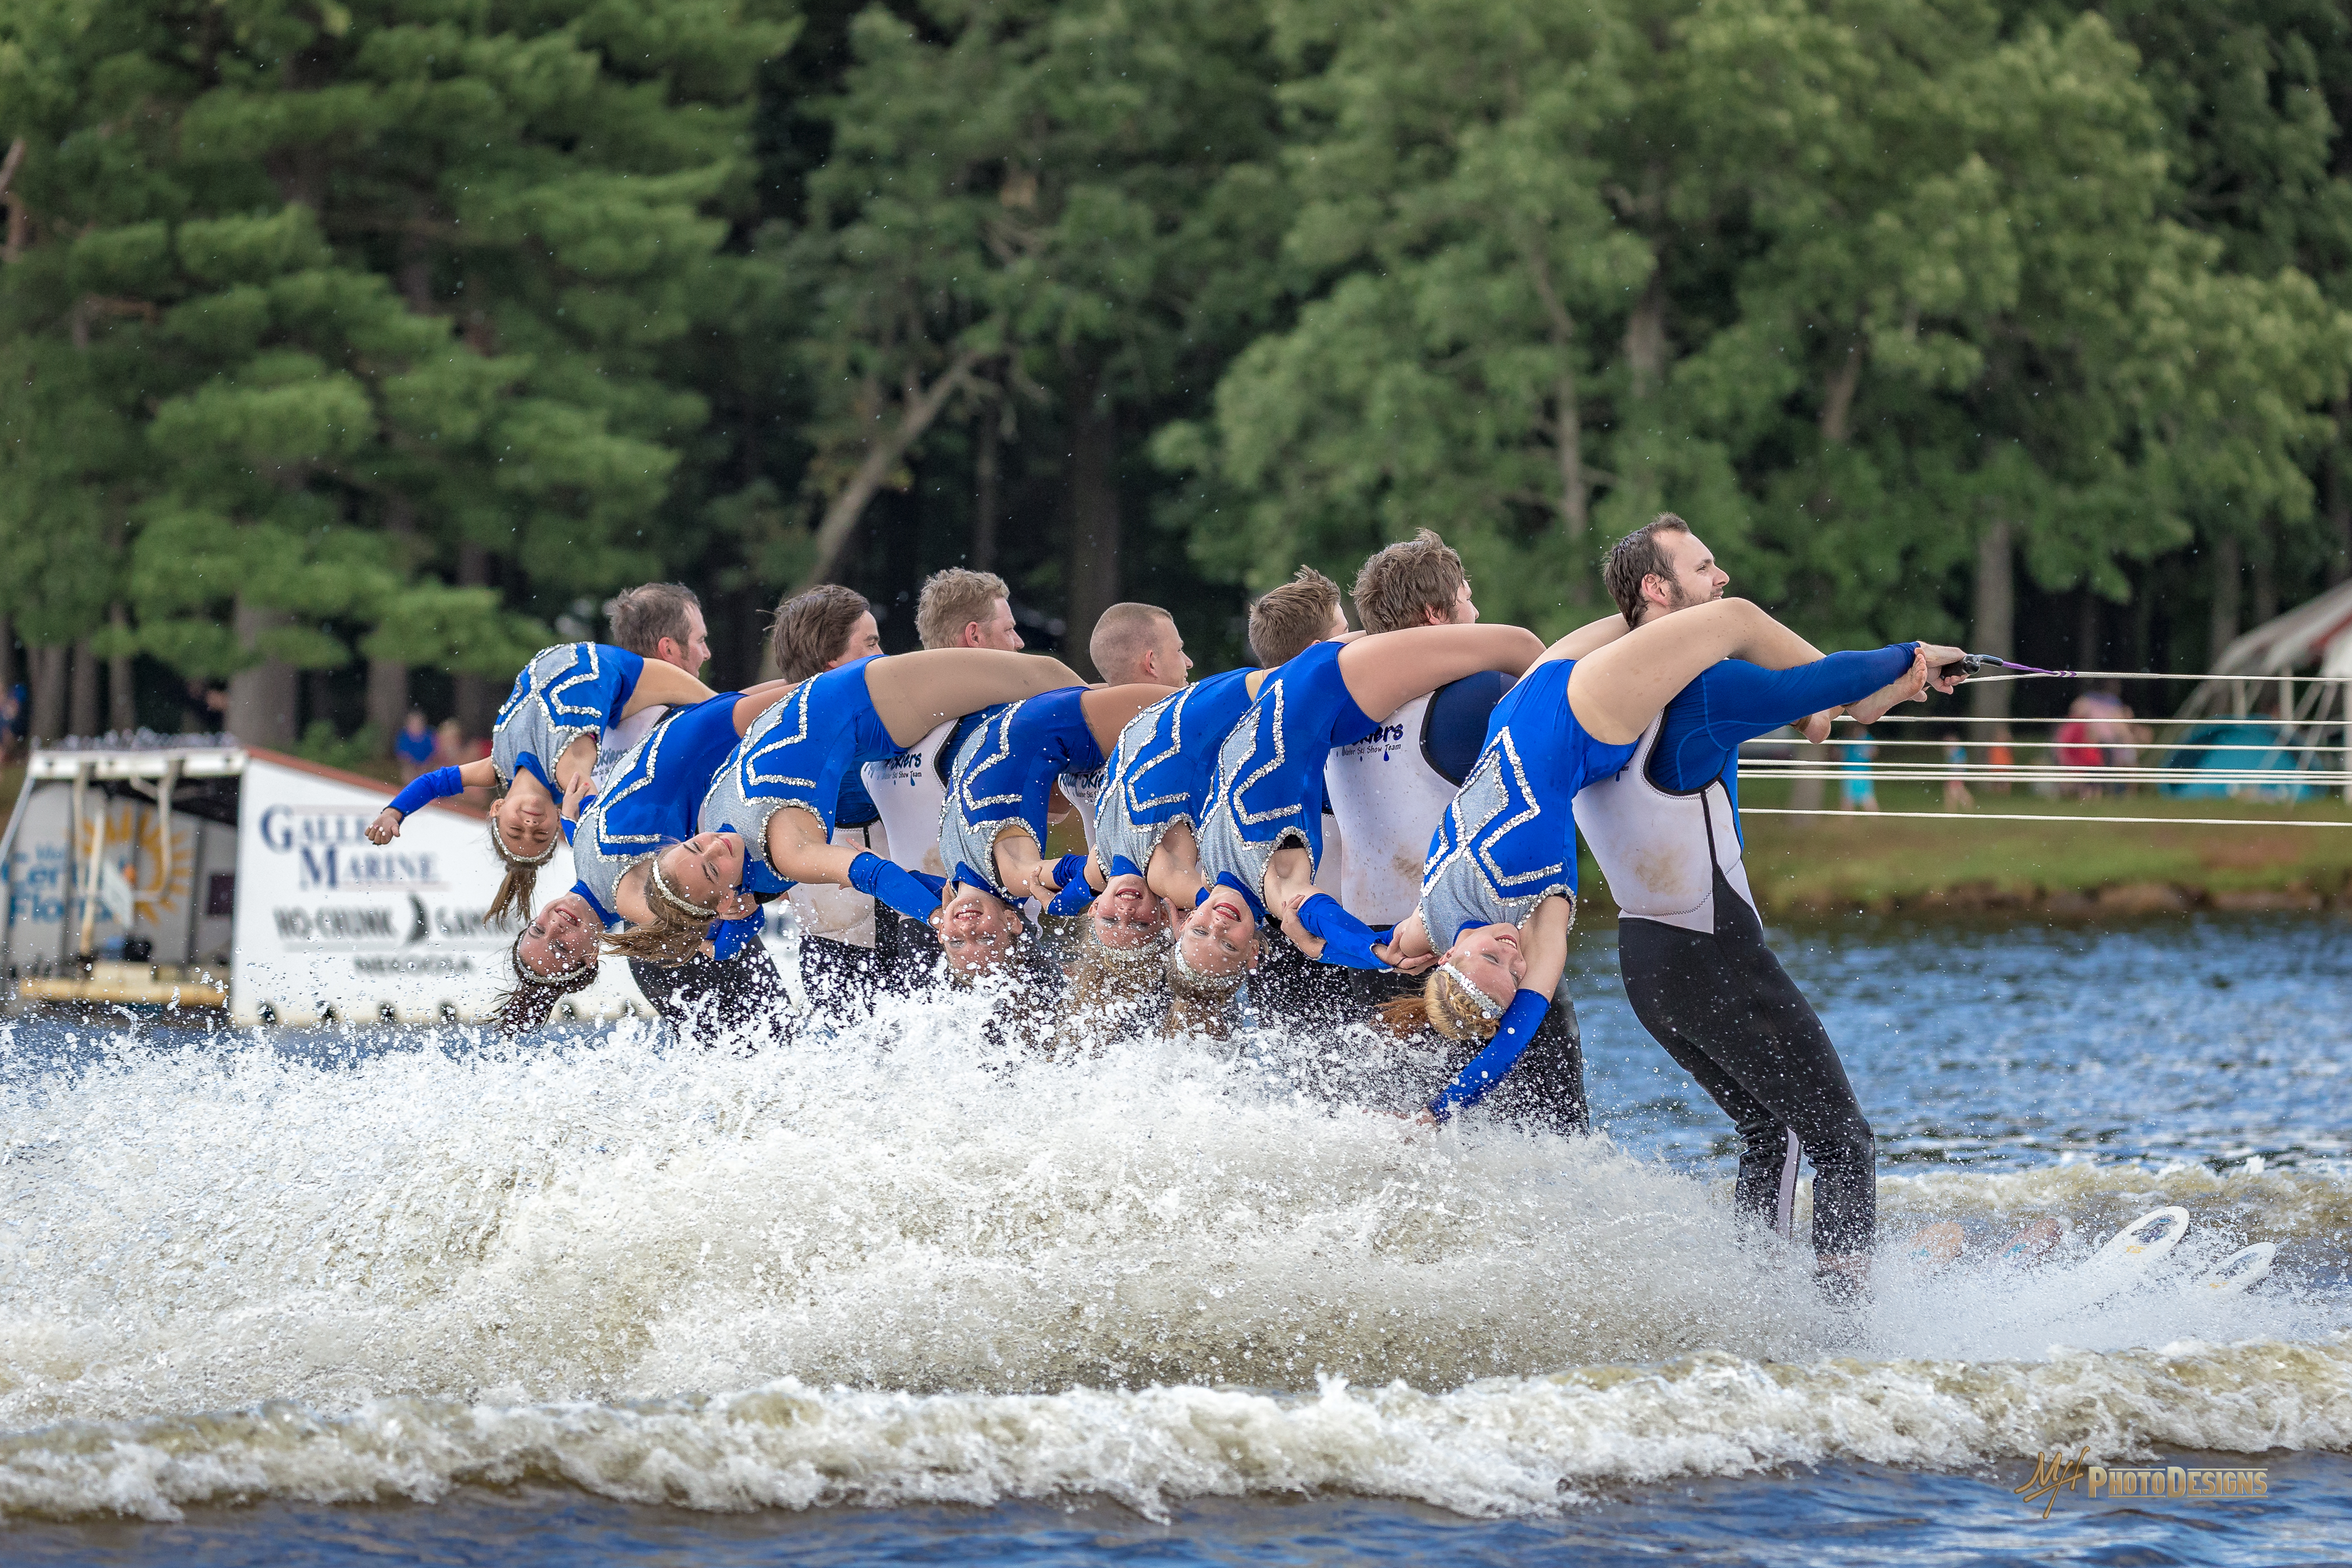 aqua-skiers-state-championship-2017-219-zf-5764-98956-1-060